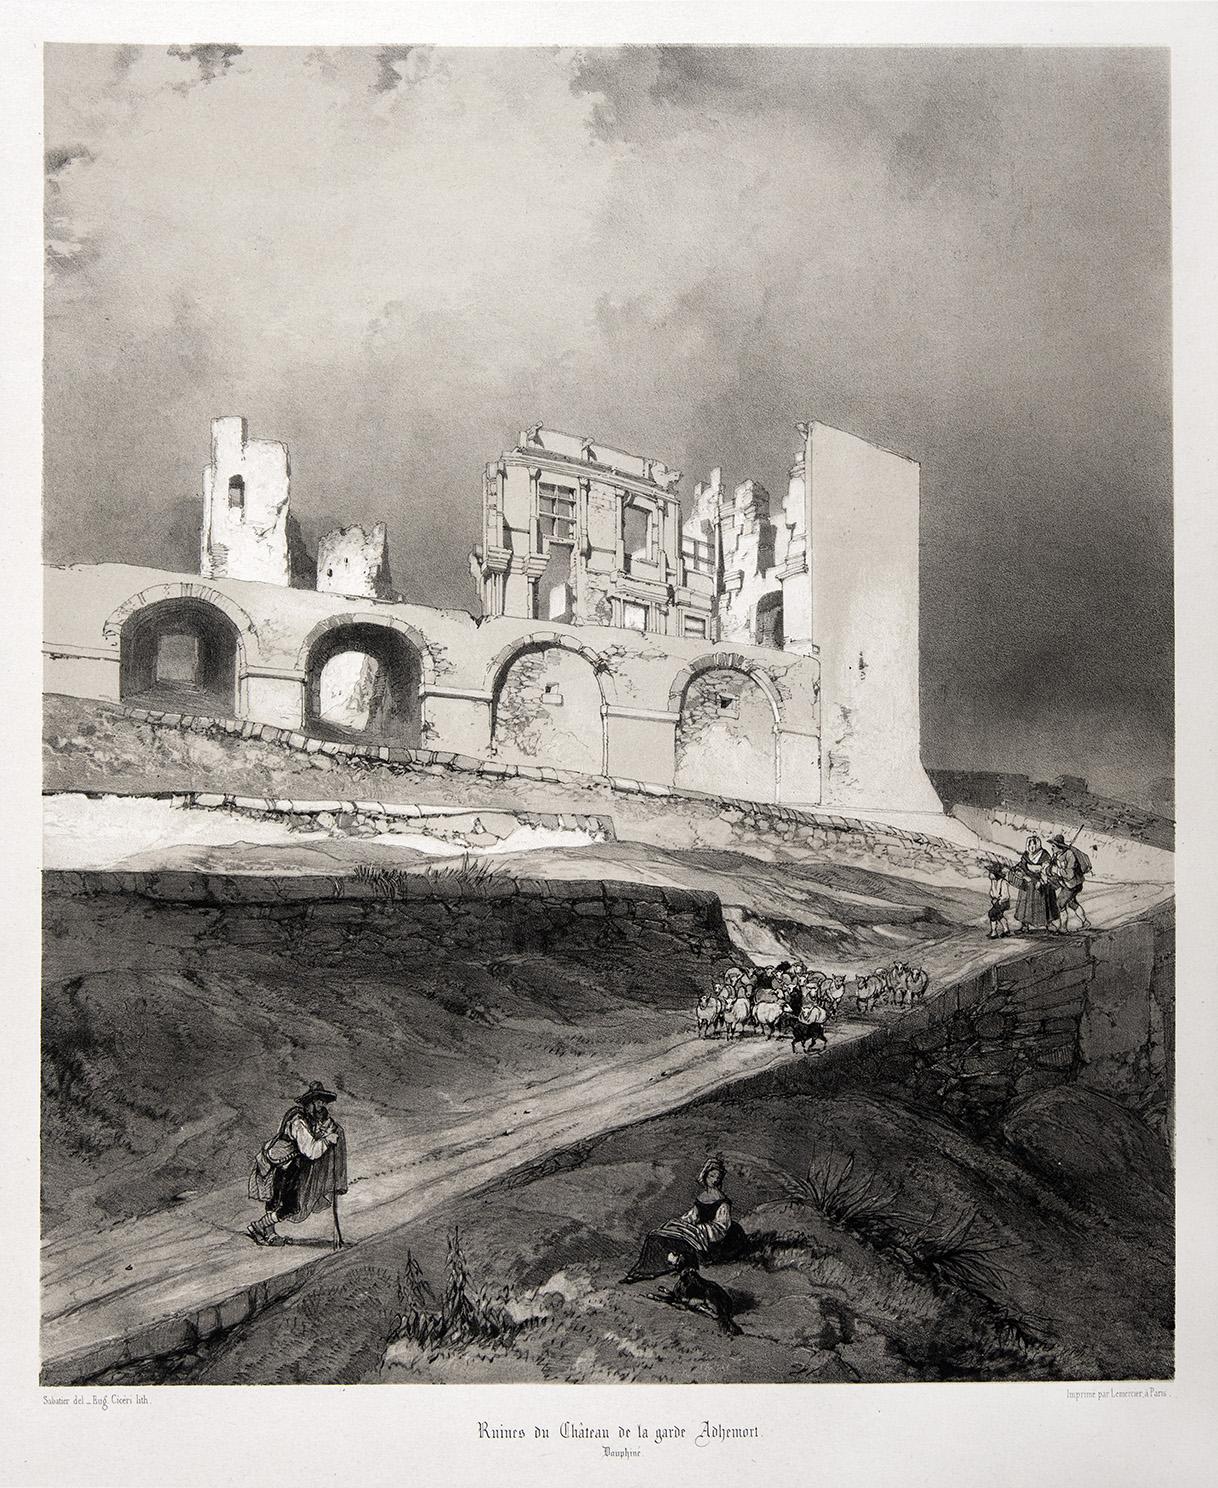 LGA - Chateau Escalin gravure Taylor 1854.jpg